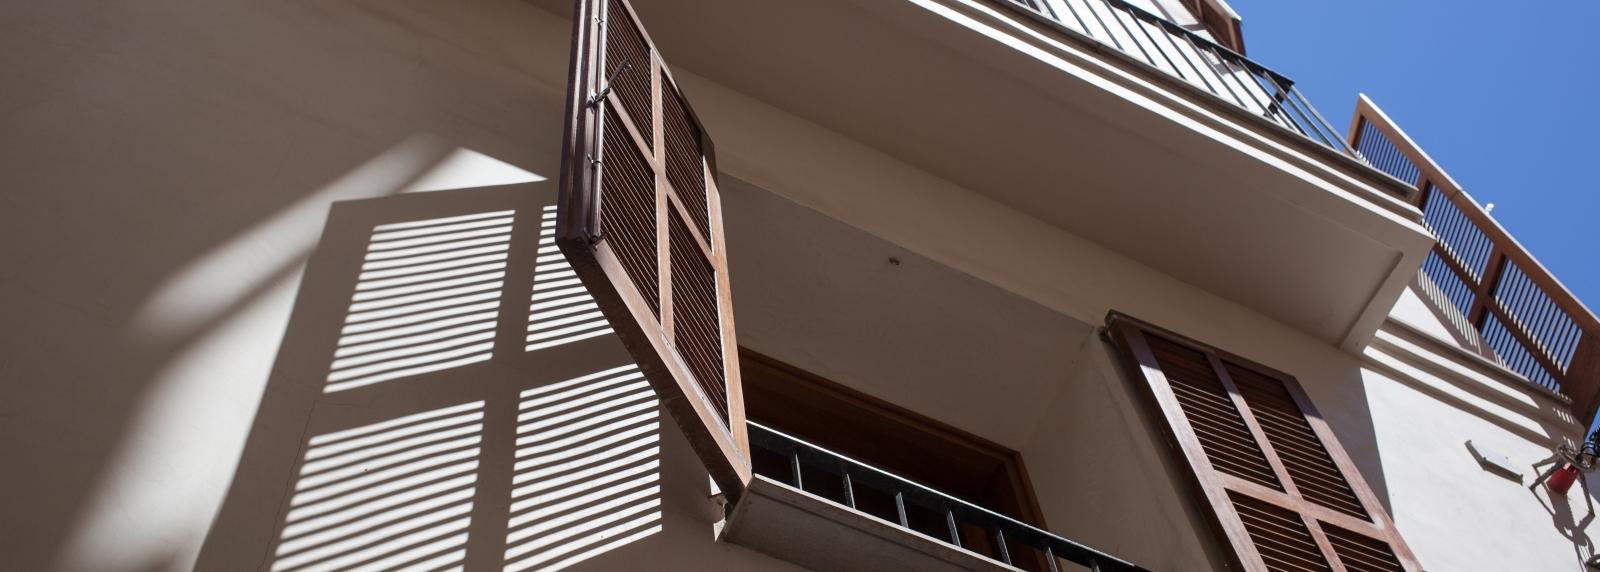 V Blinds Outdoor Roofing Systems Melbourne